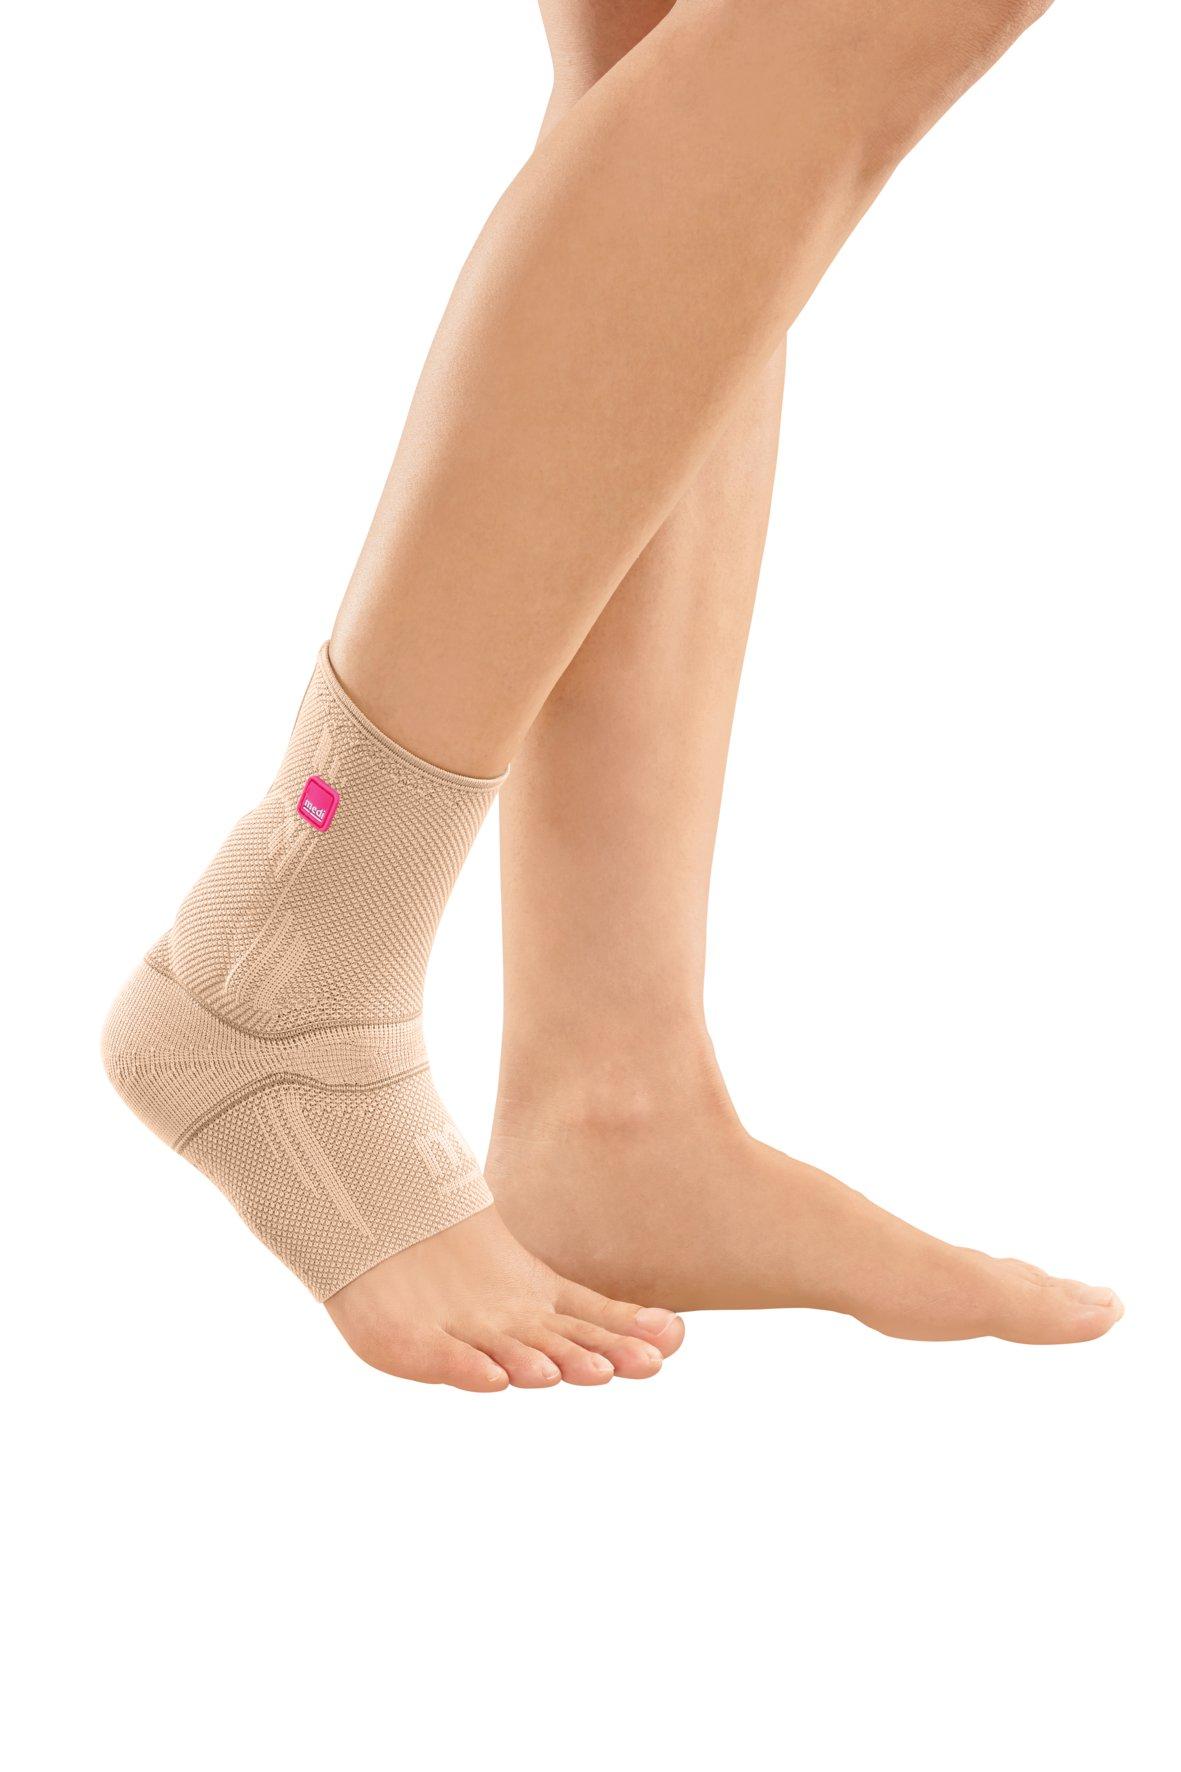 Medi Achimed Knit Ankle Support for Men & Women (Sand) Size II